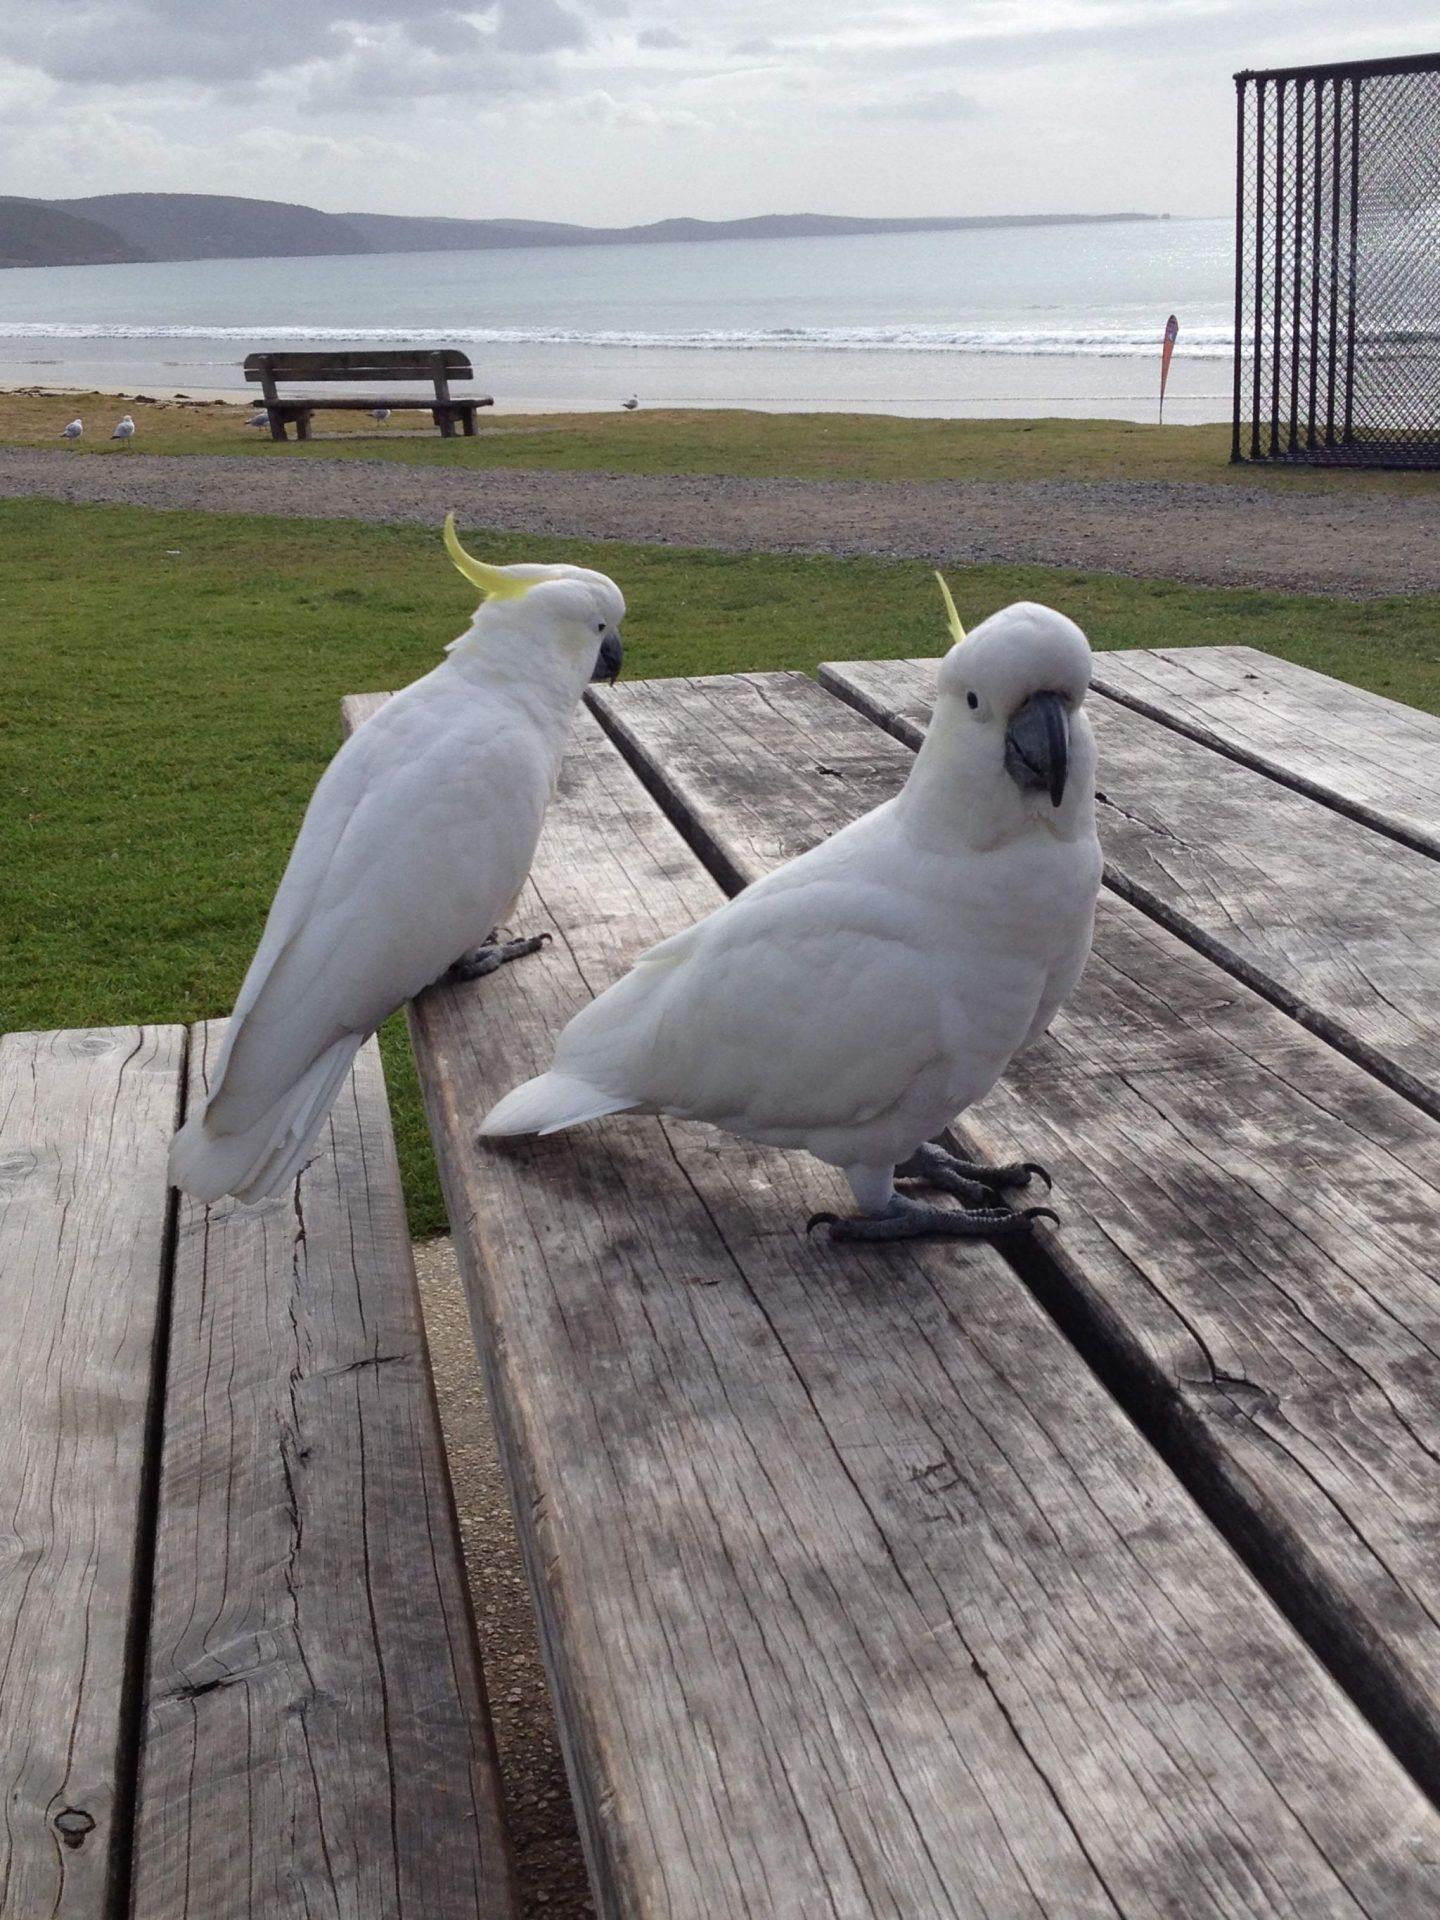 Cockatoos in Lorne, Victoria